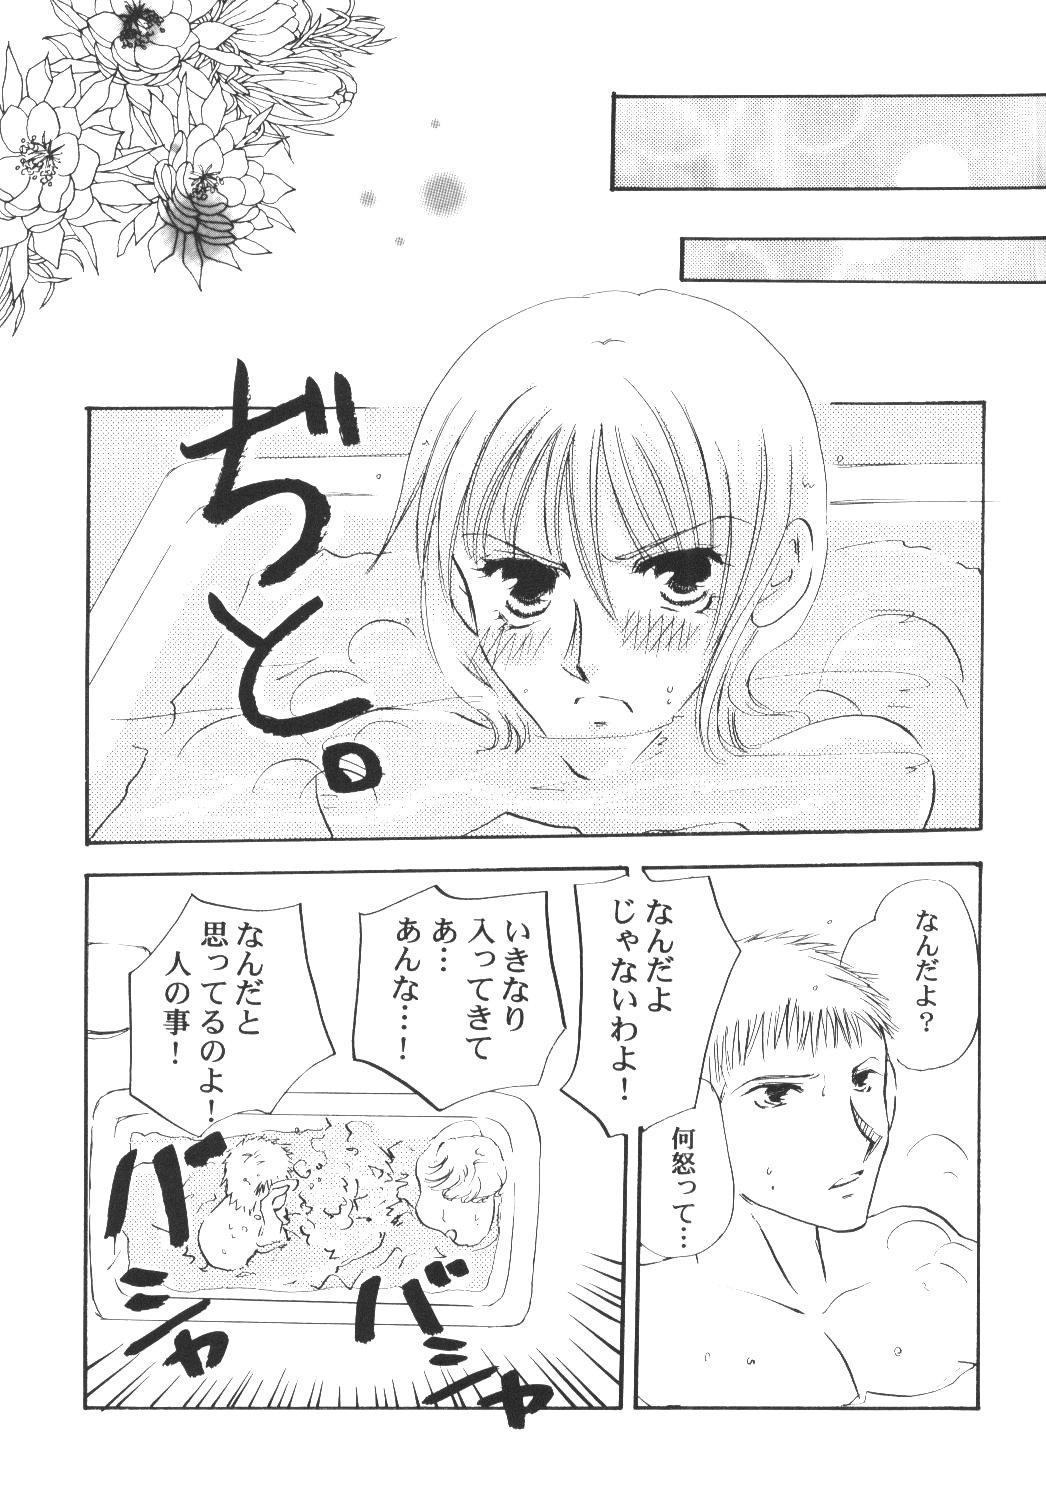 Yume Ichiya 2 153